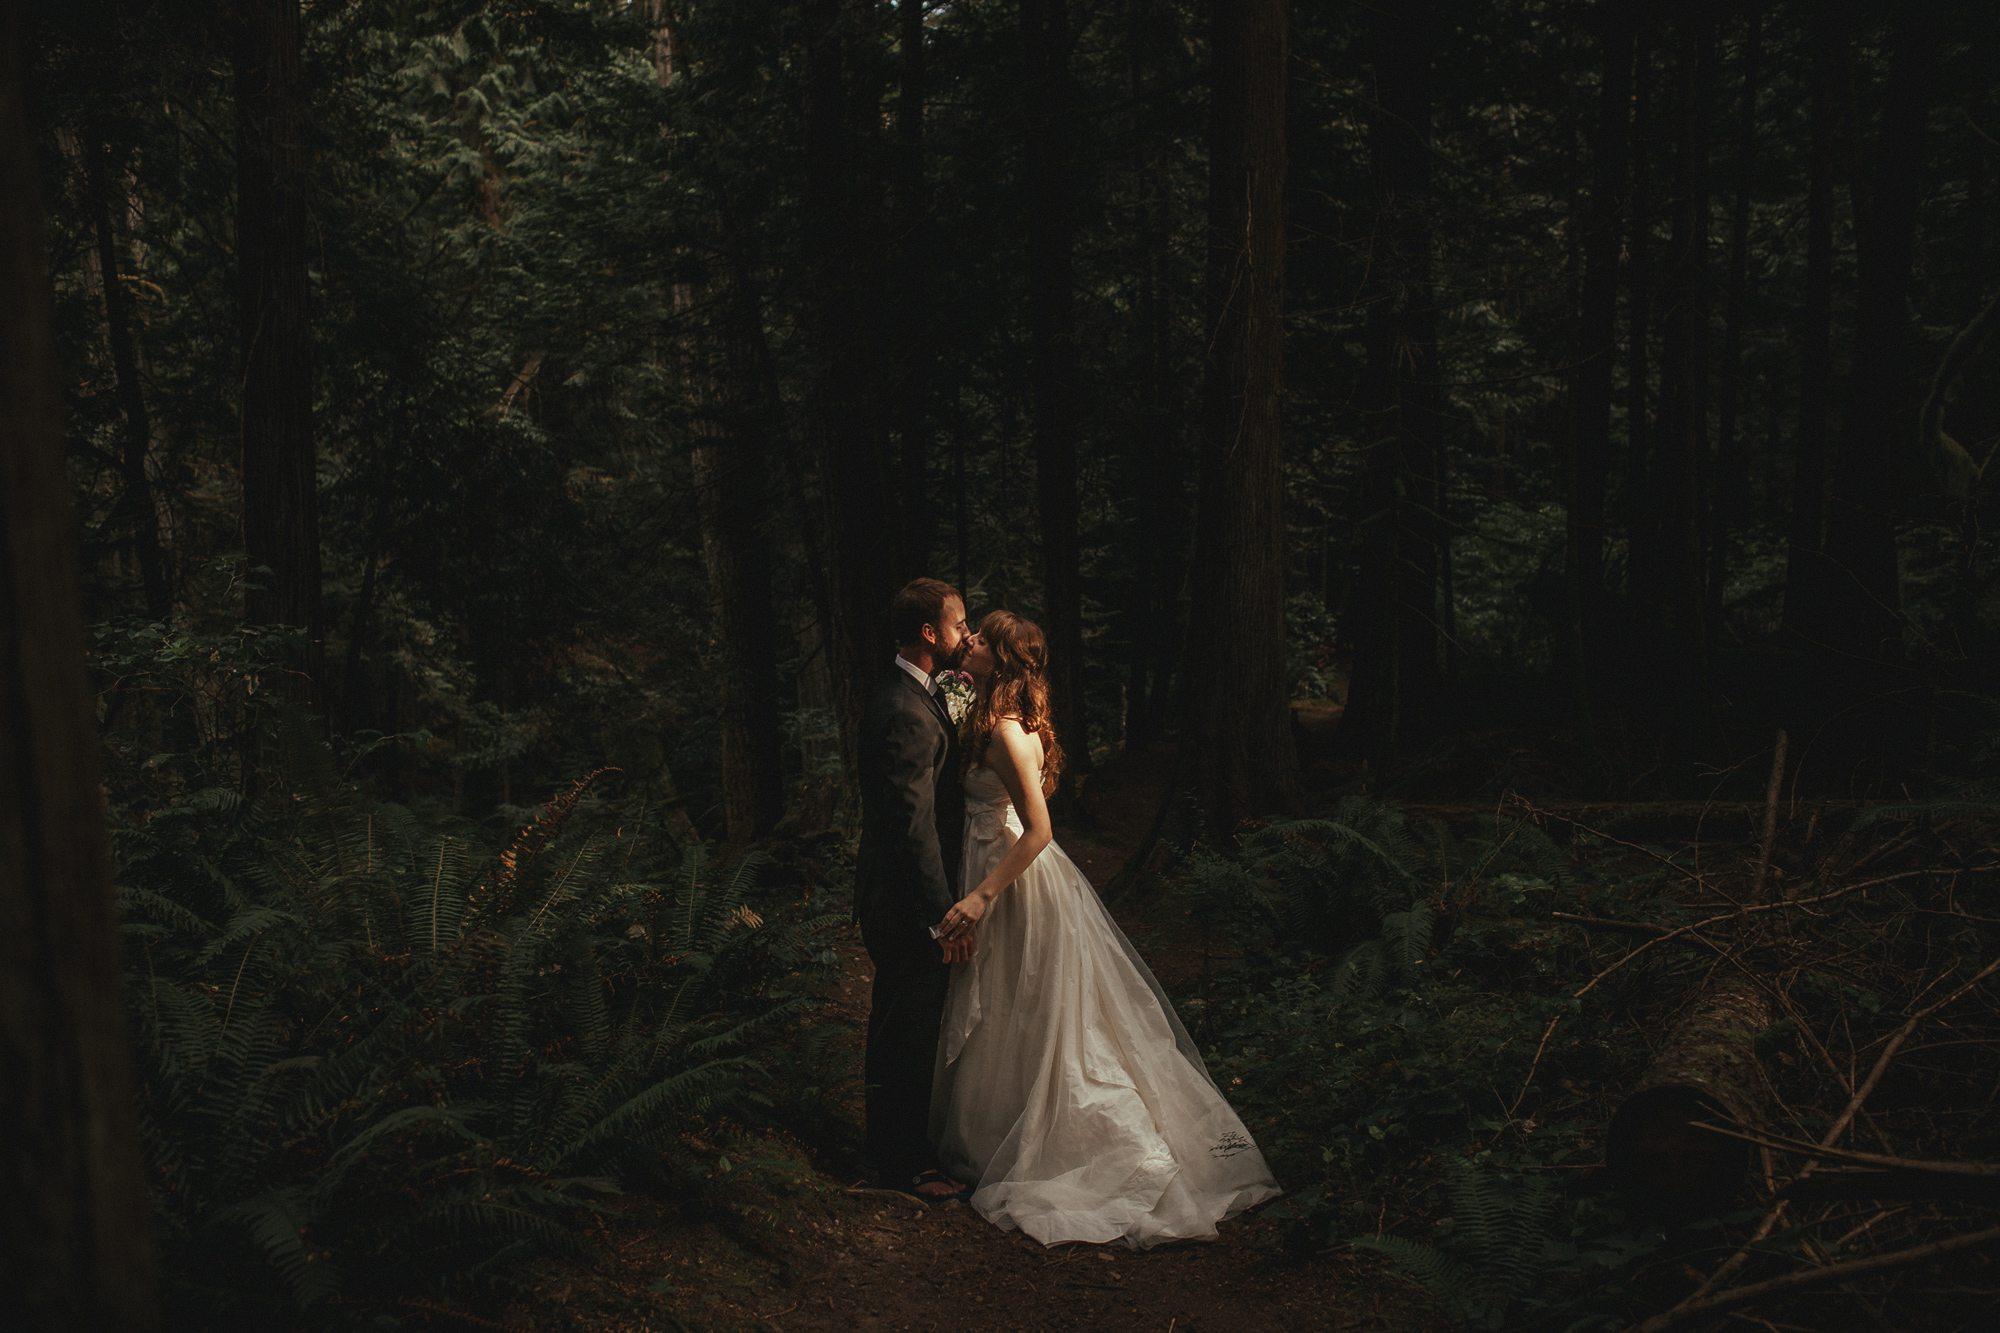 gibsons-wedding-photography-robert-devon91